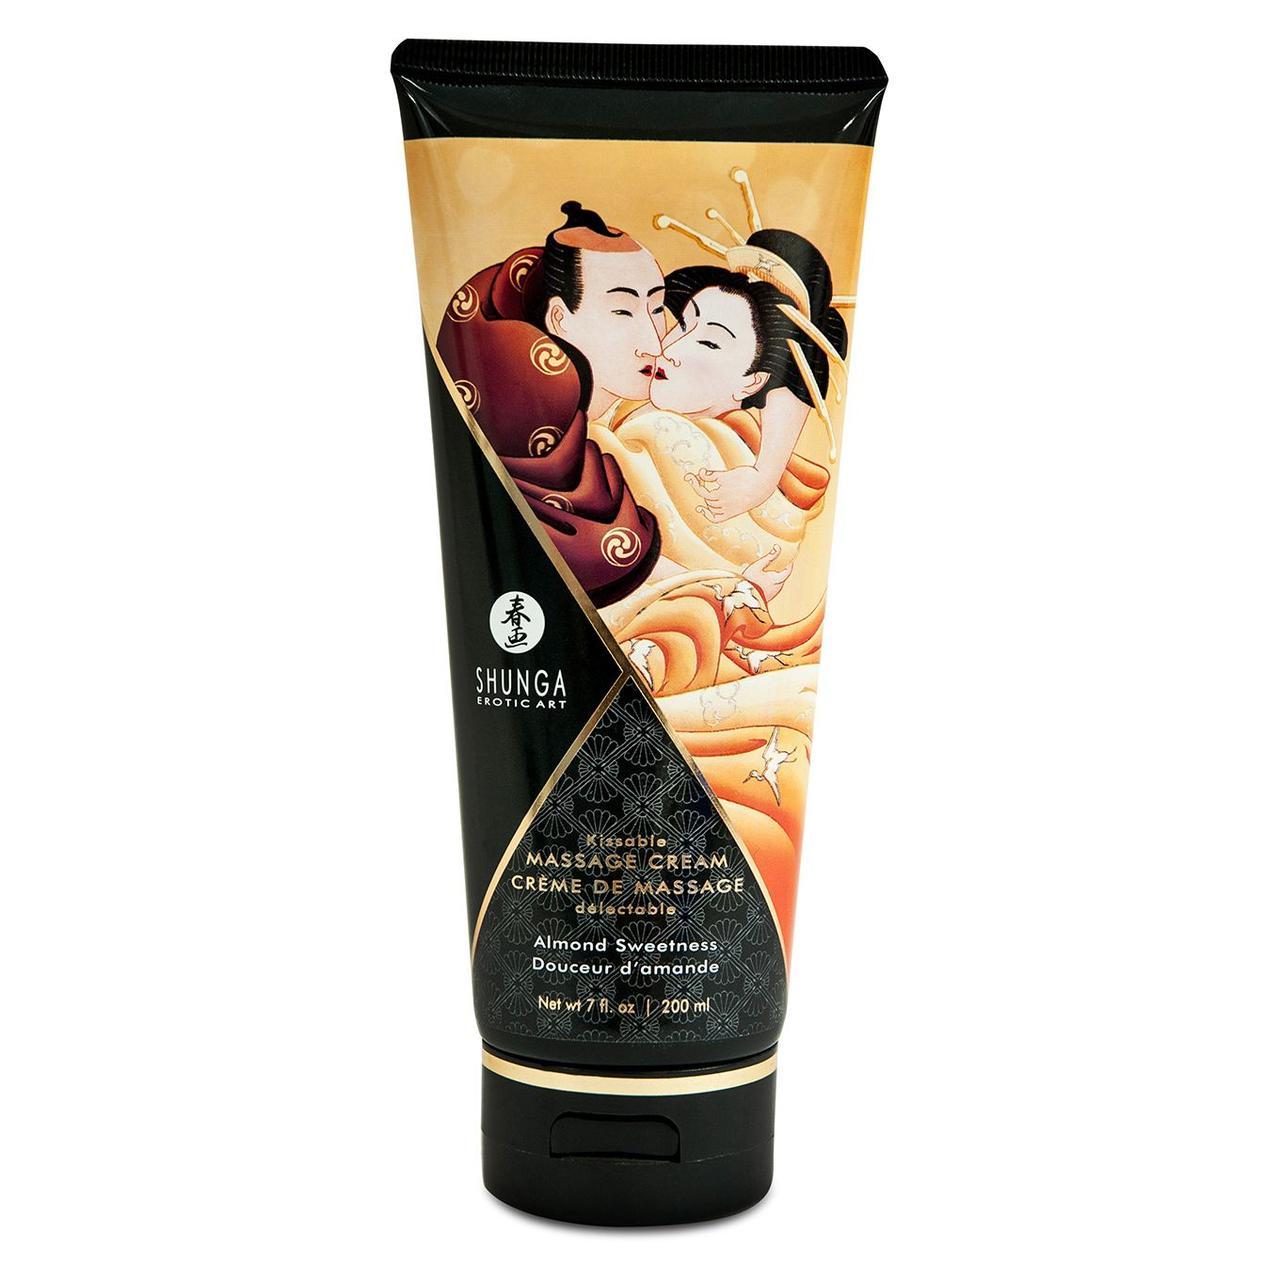 Съедобный массажный крем Shunga Kissable Massage Cream, 200 мл